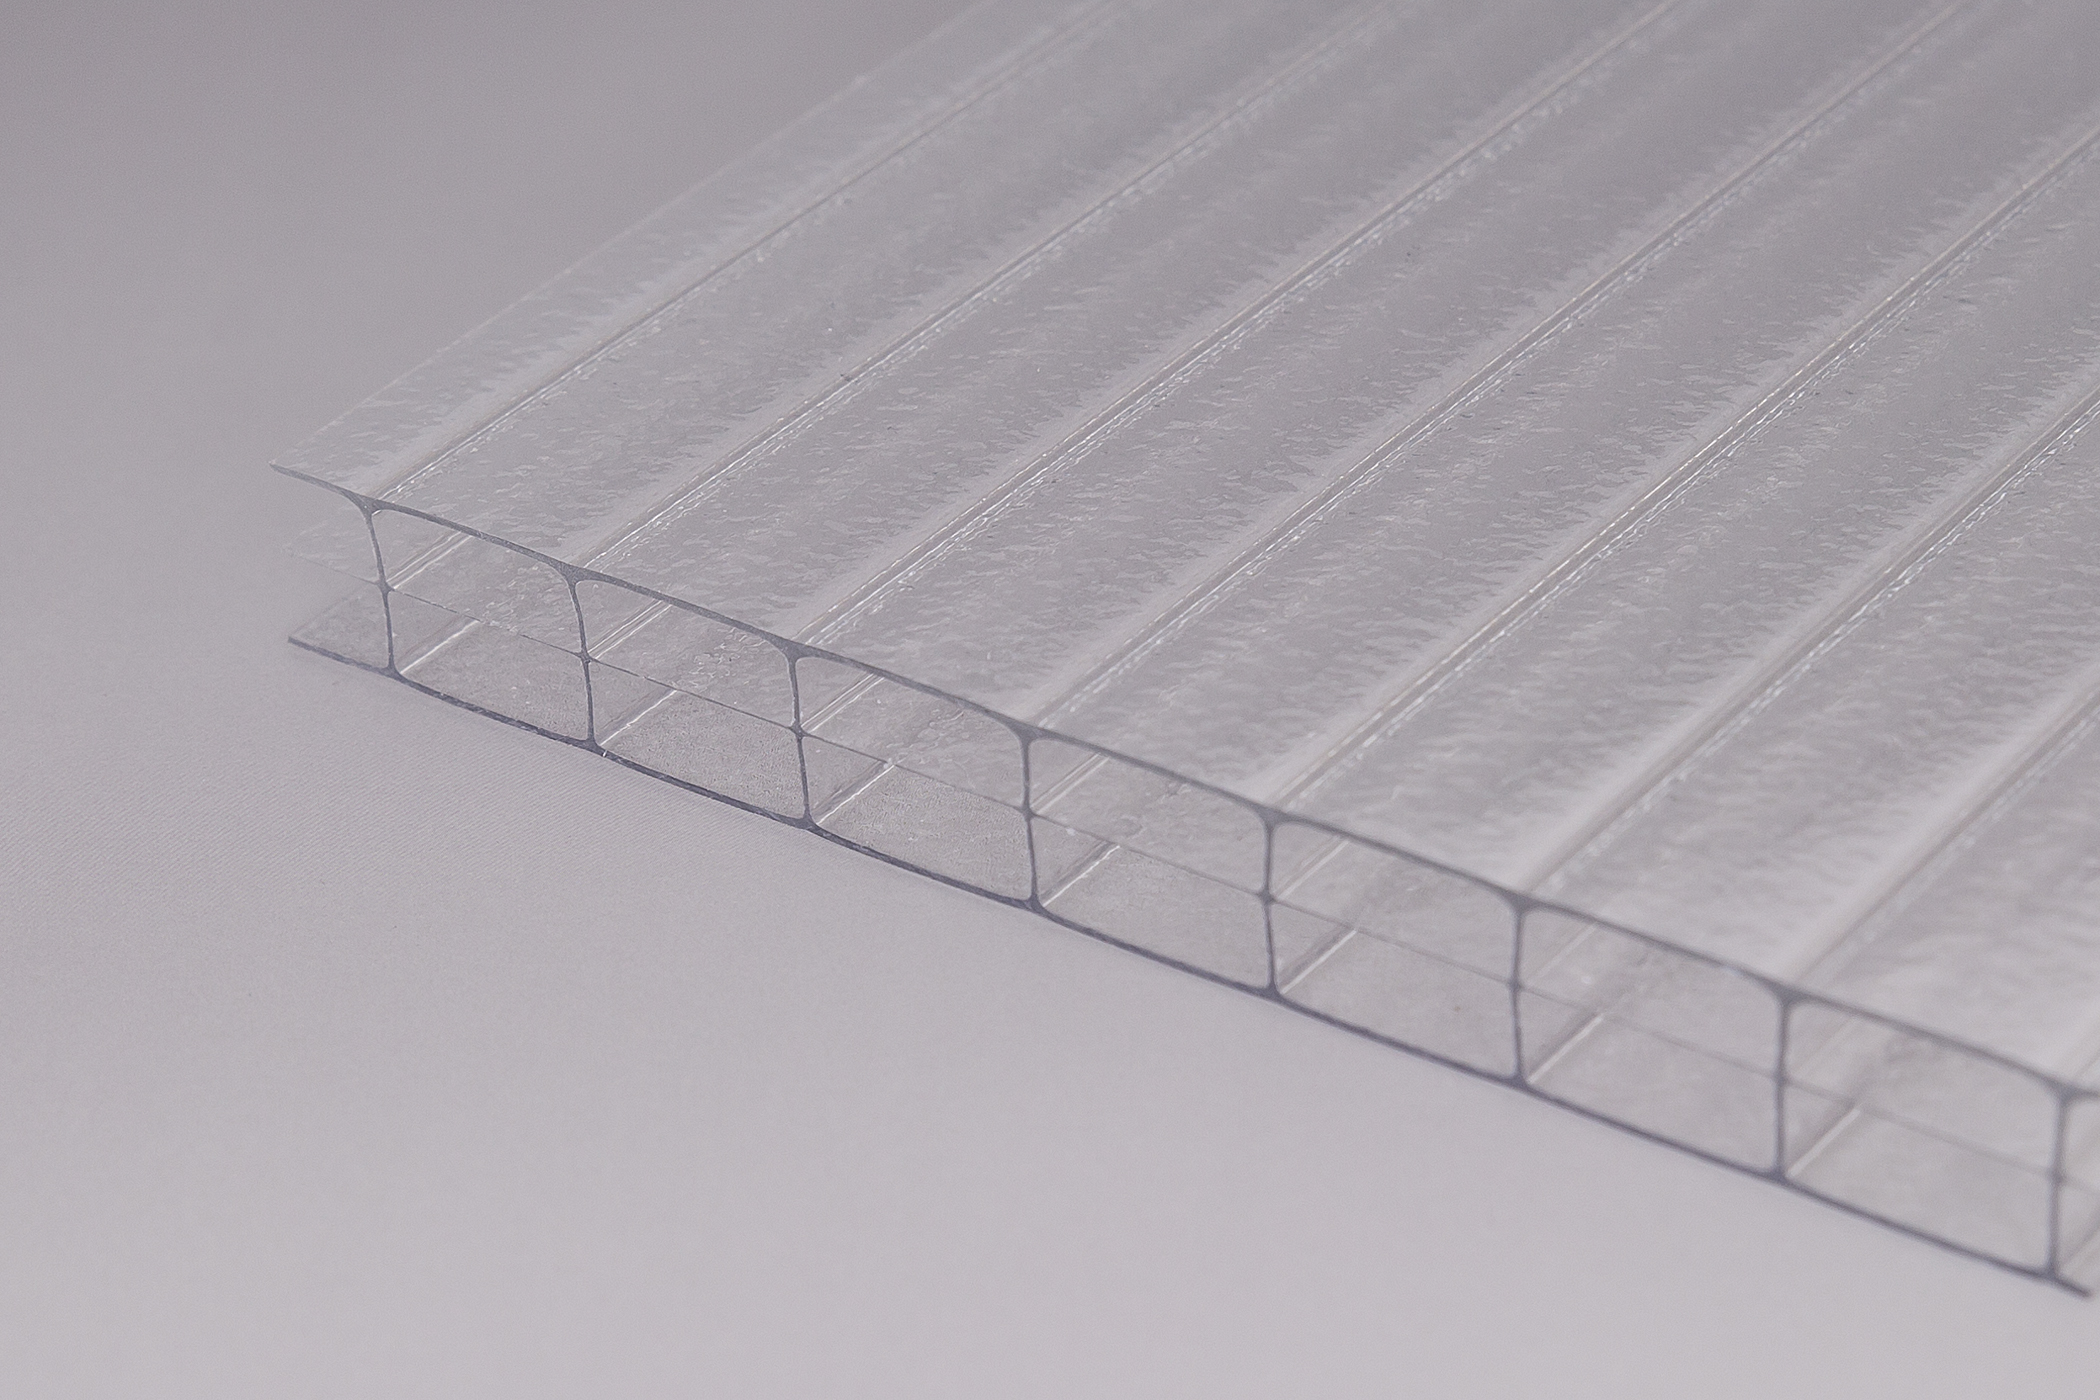 meine bedachung stegplatten 16 mm polycarbonat innenstruktur. Black Bedroom Furniture Sets. Home Design Ideas